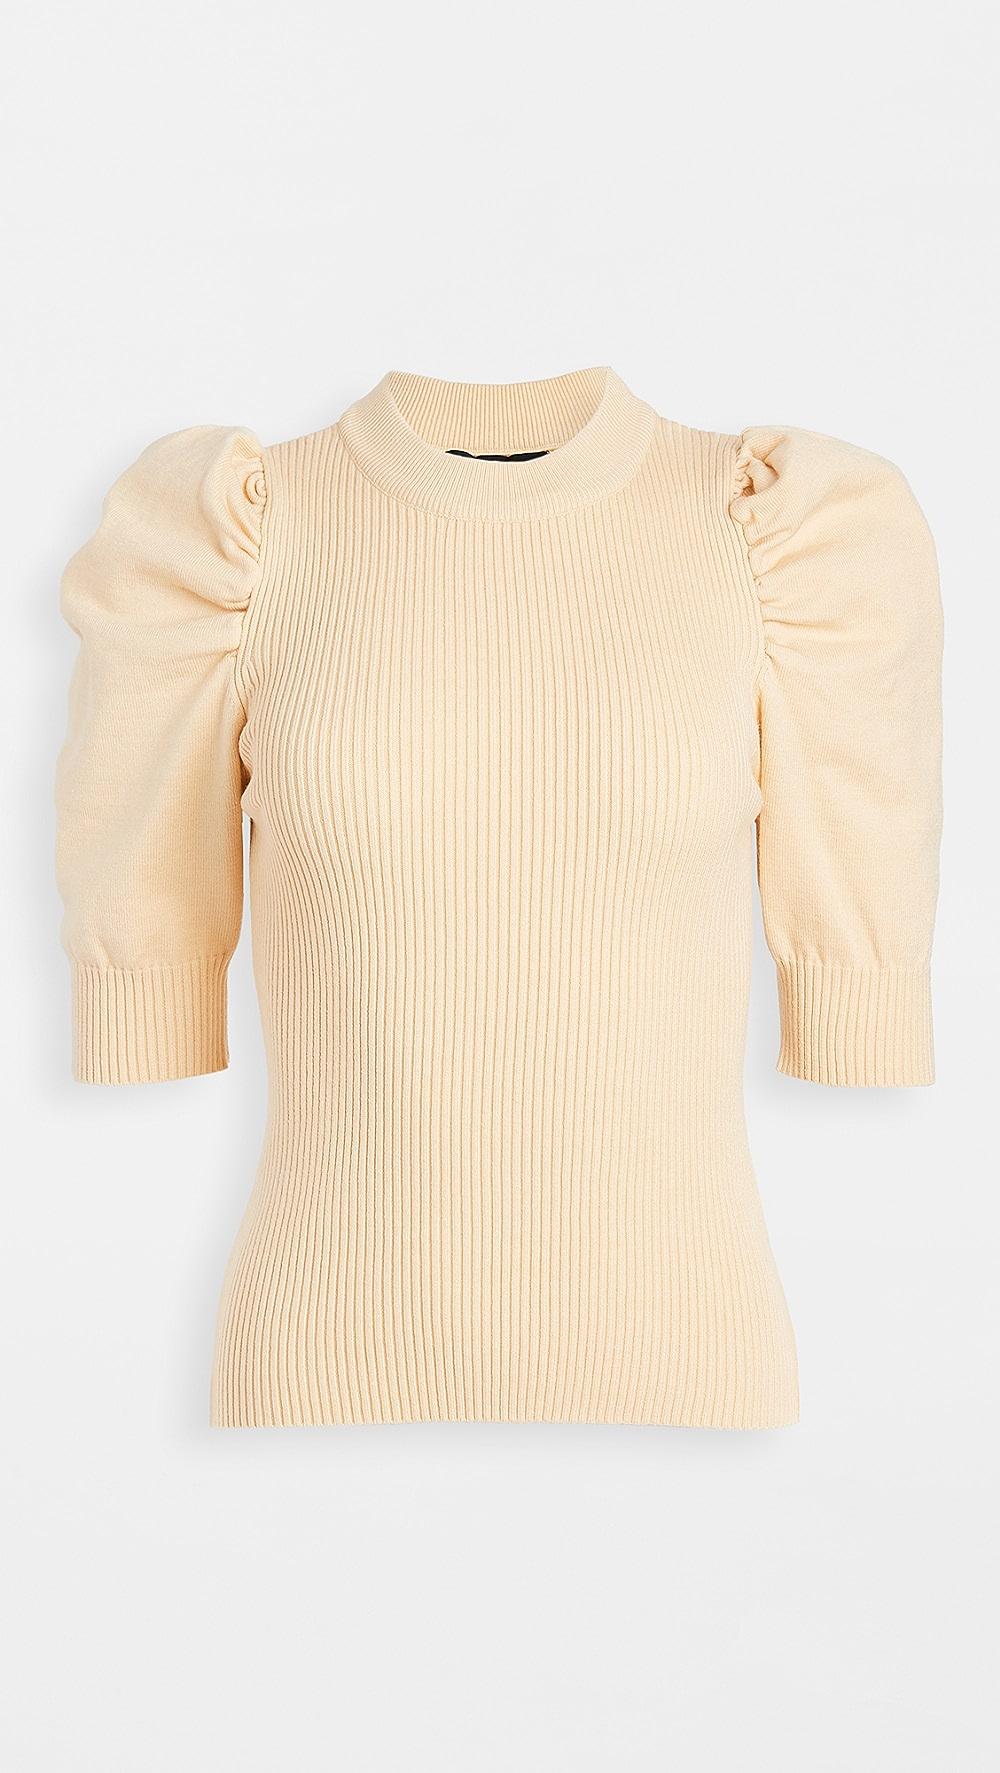 2019 New Style En Saison - Puff Sleeve Sweater Top Regular Tea Drinking Improves Your Health